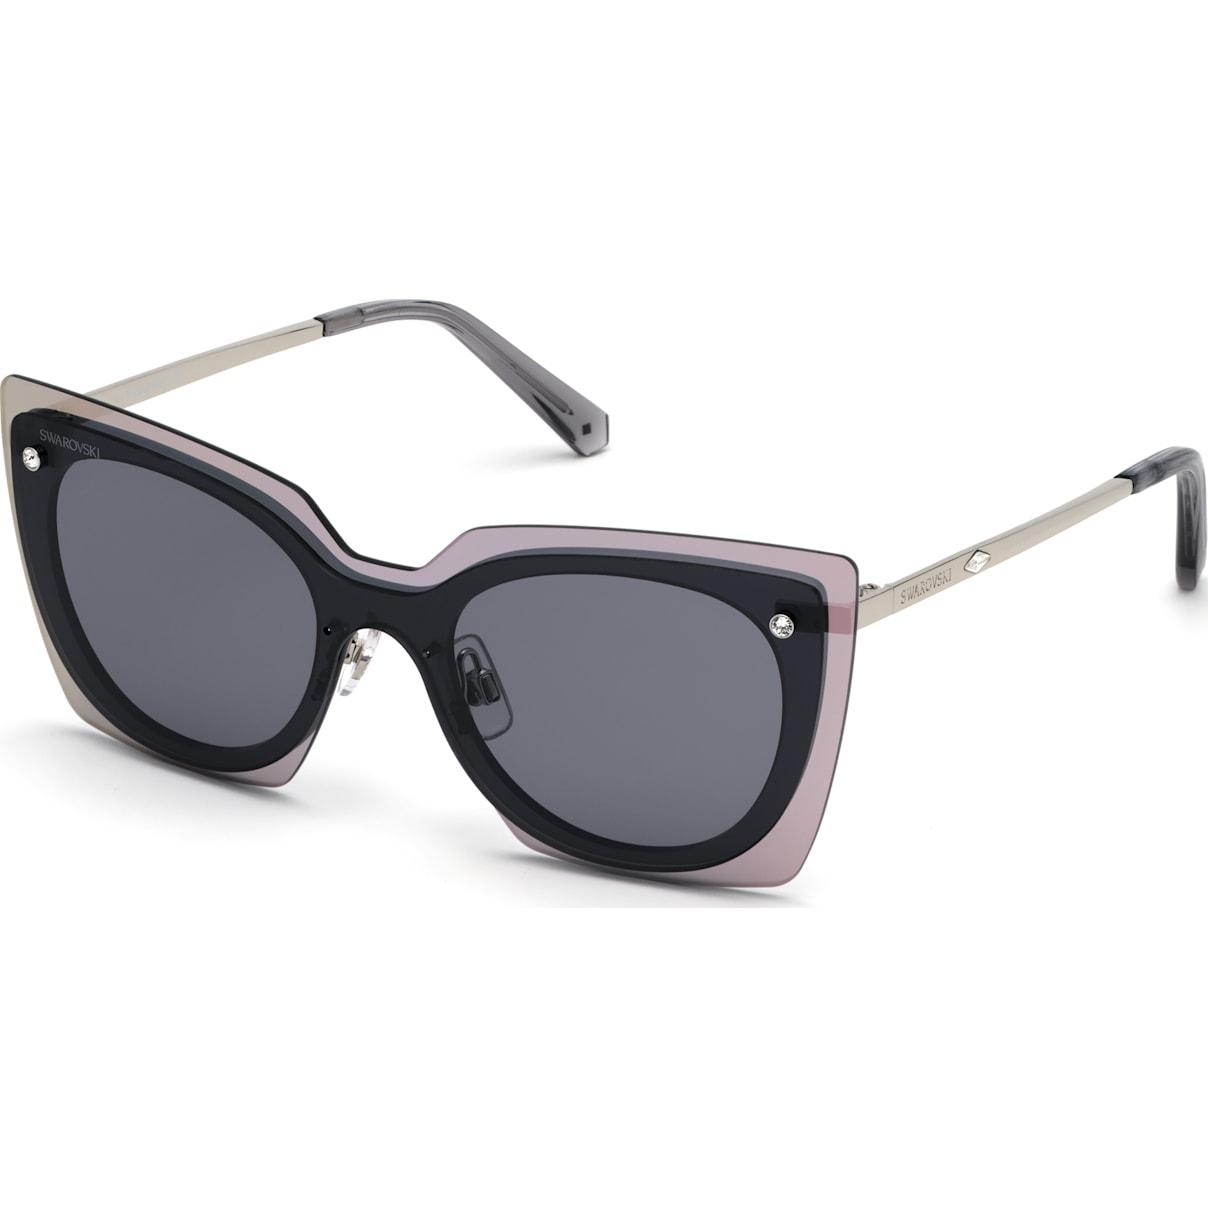 Swarovski Swarovski Sunglasses, SK0201-16A, Gray